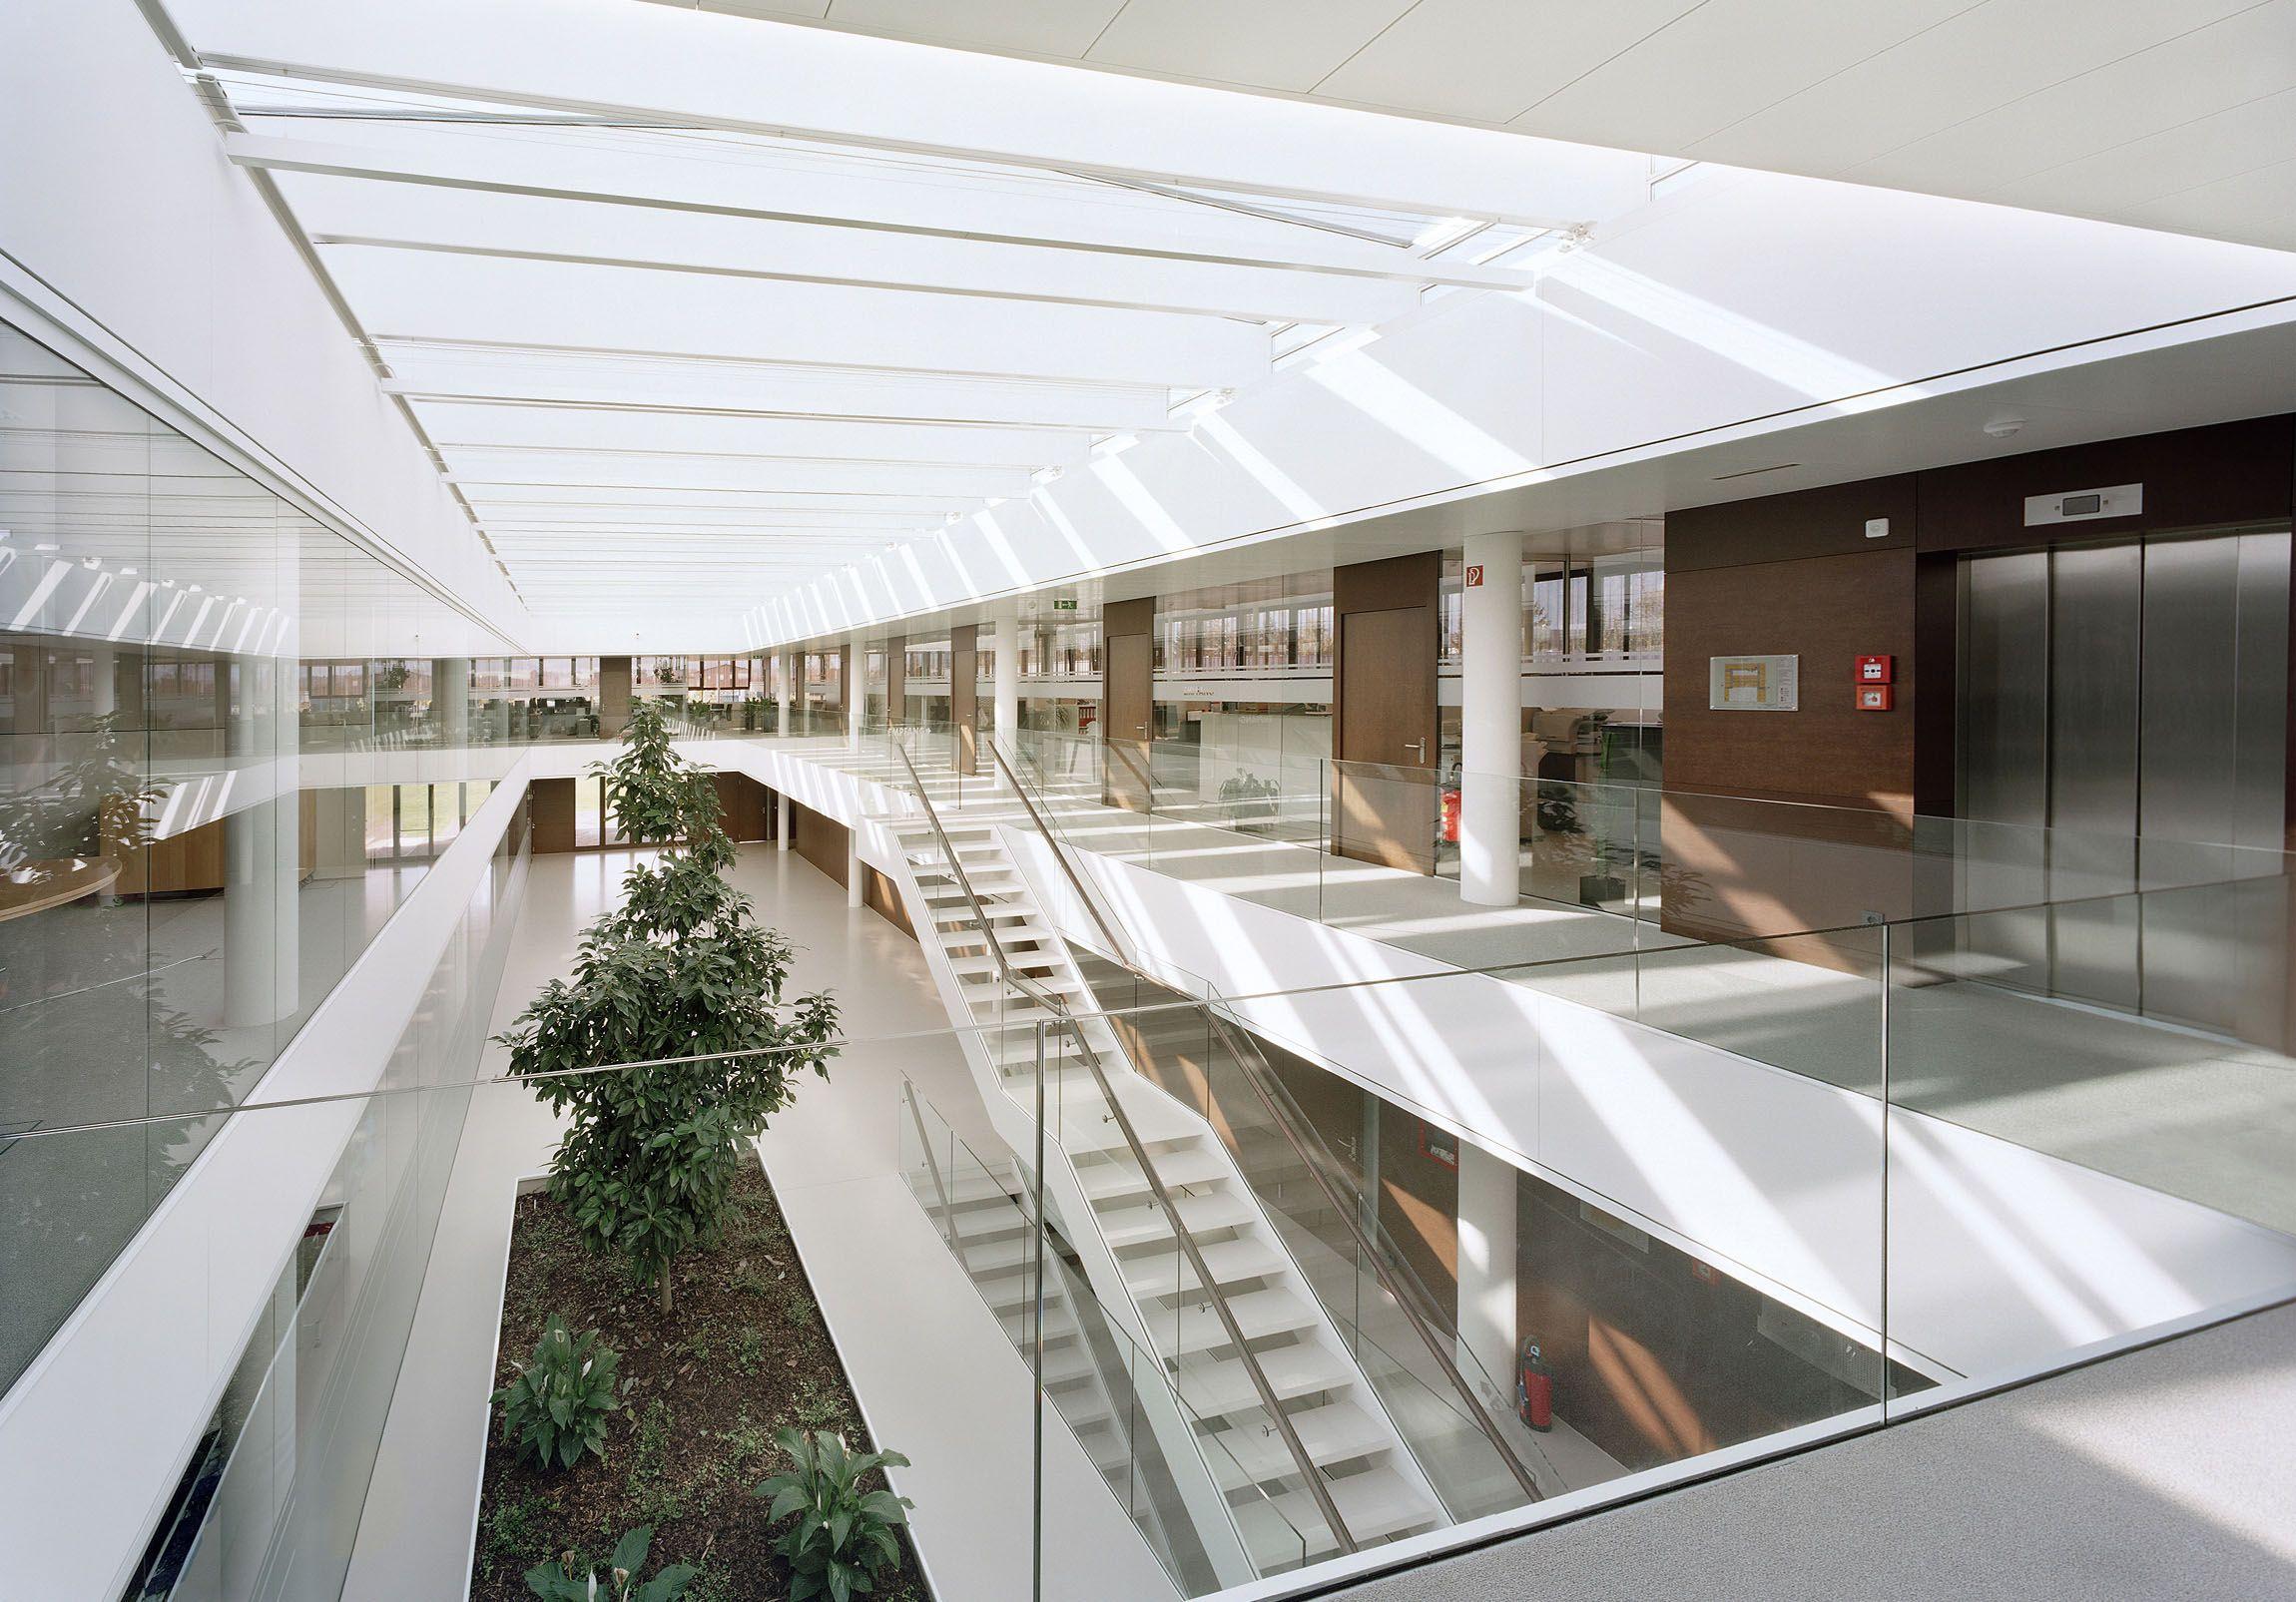 Architecture atrium google zoeken interesting for Architect zoeken